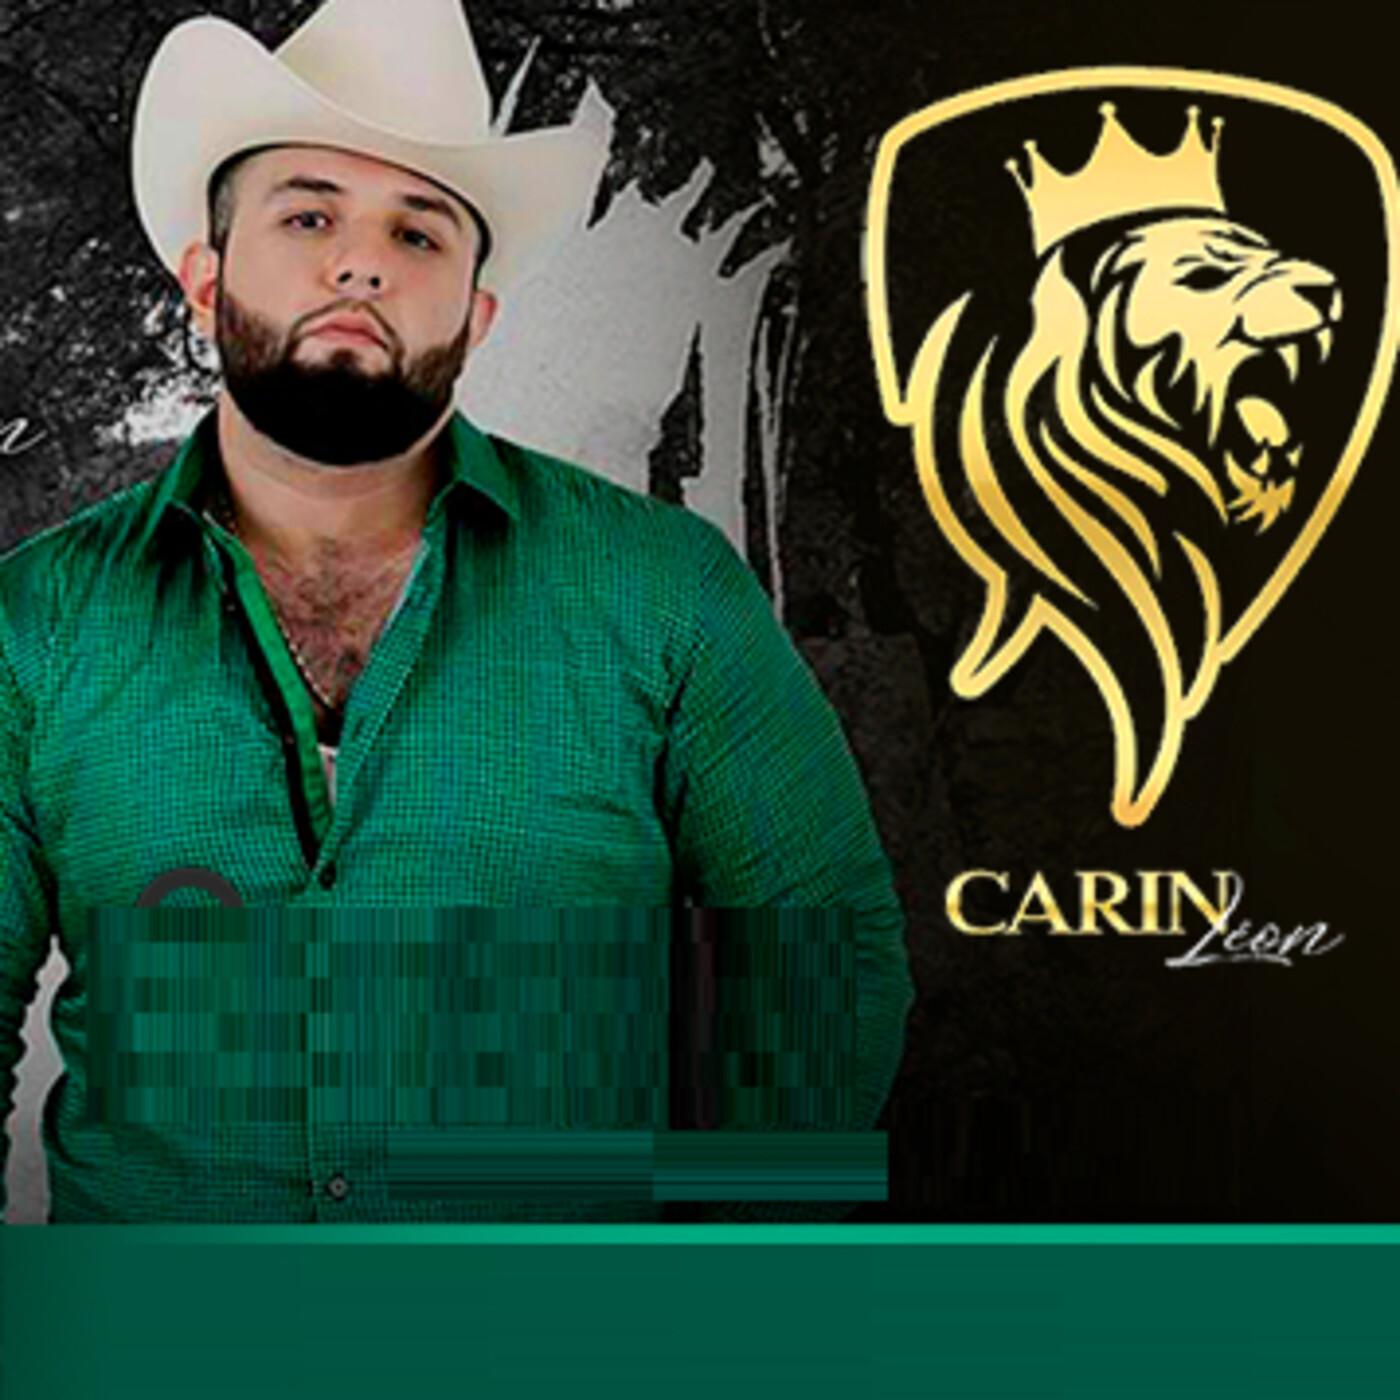 Carin Leon - Bien Leon